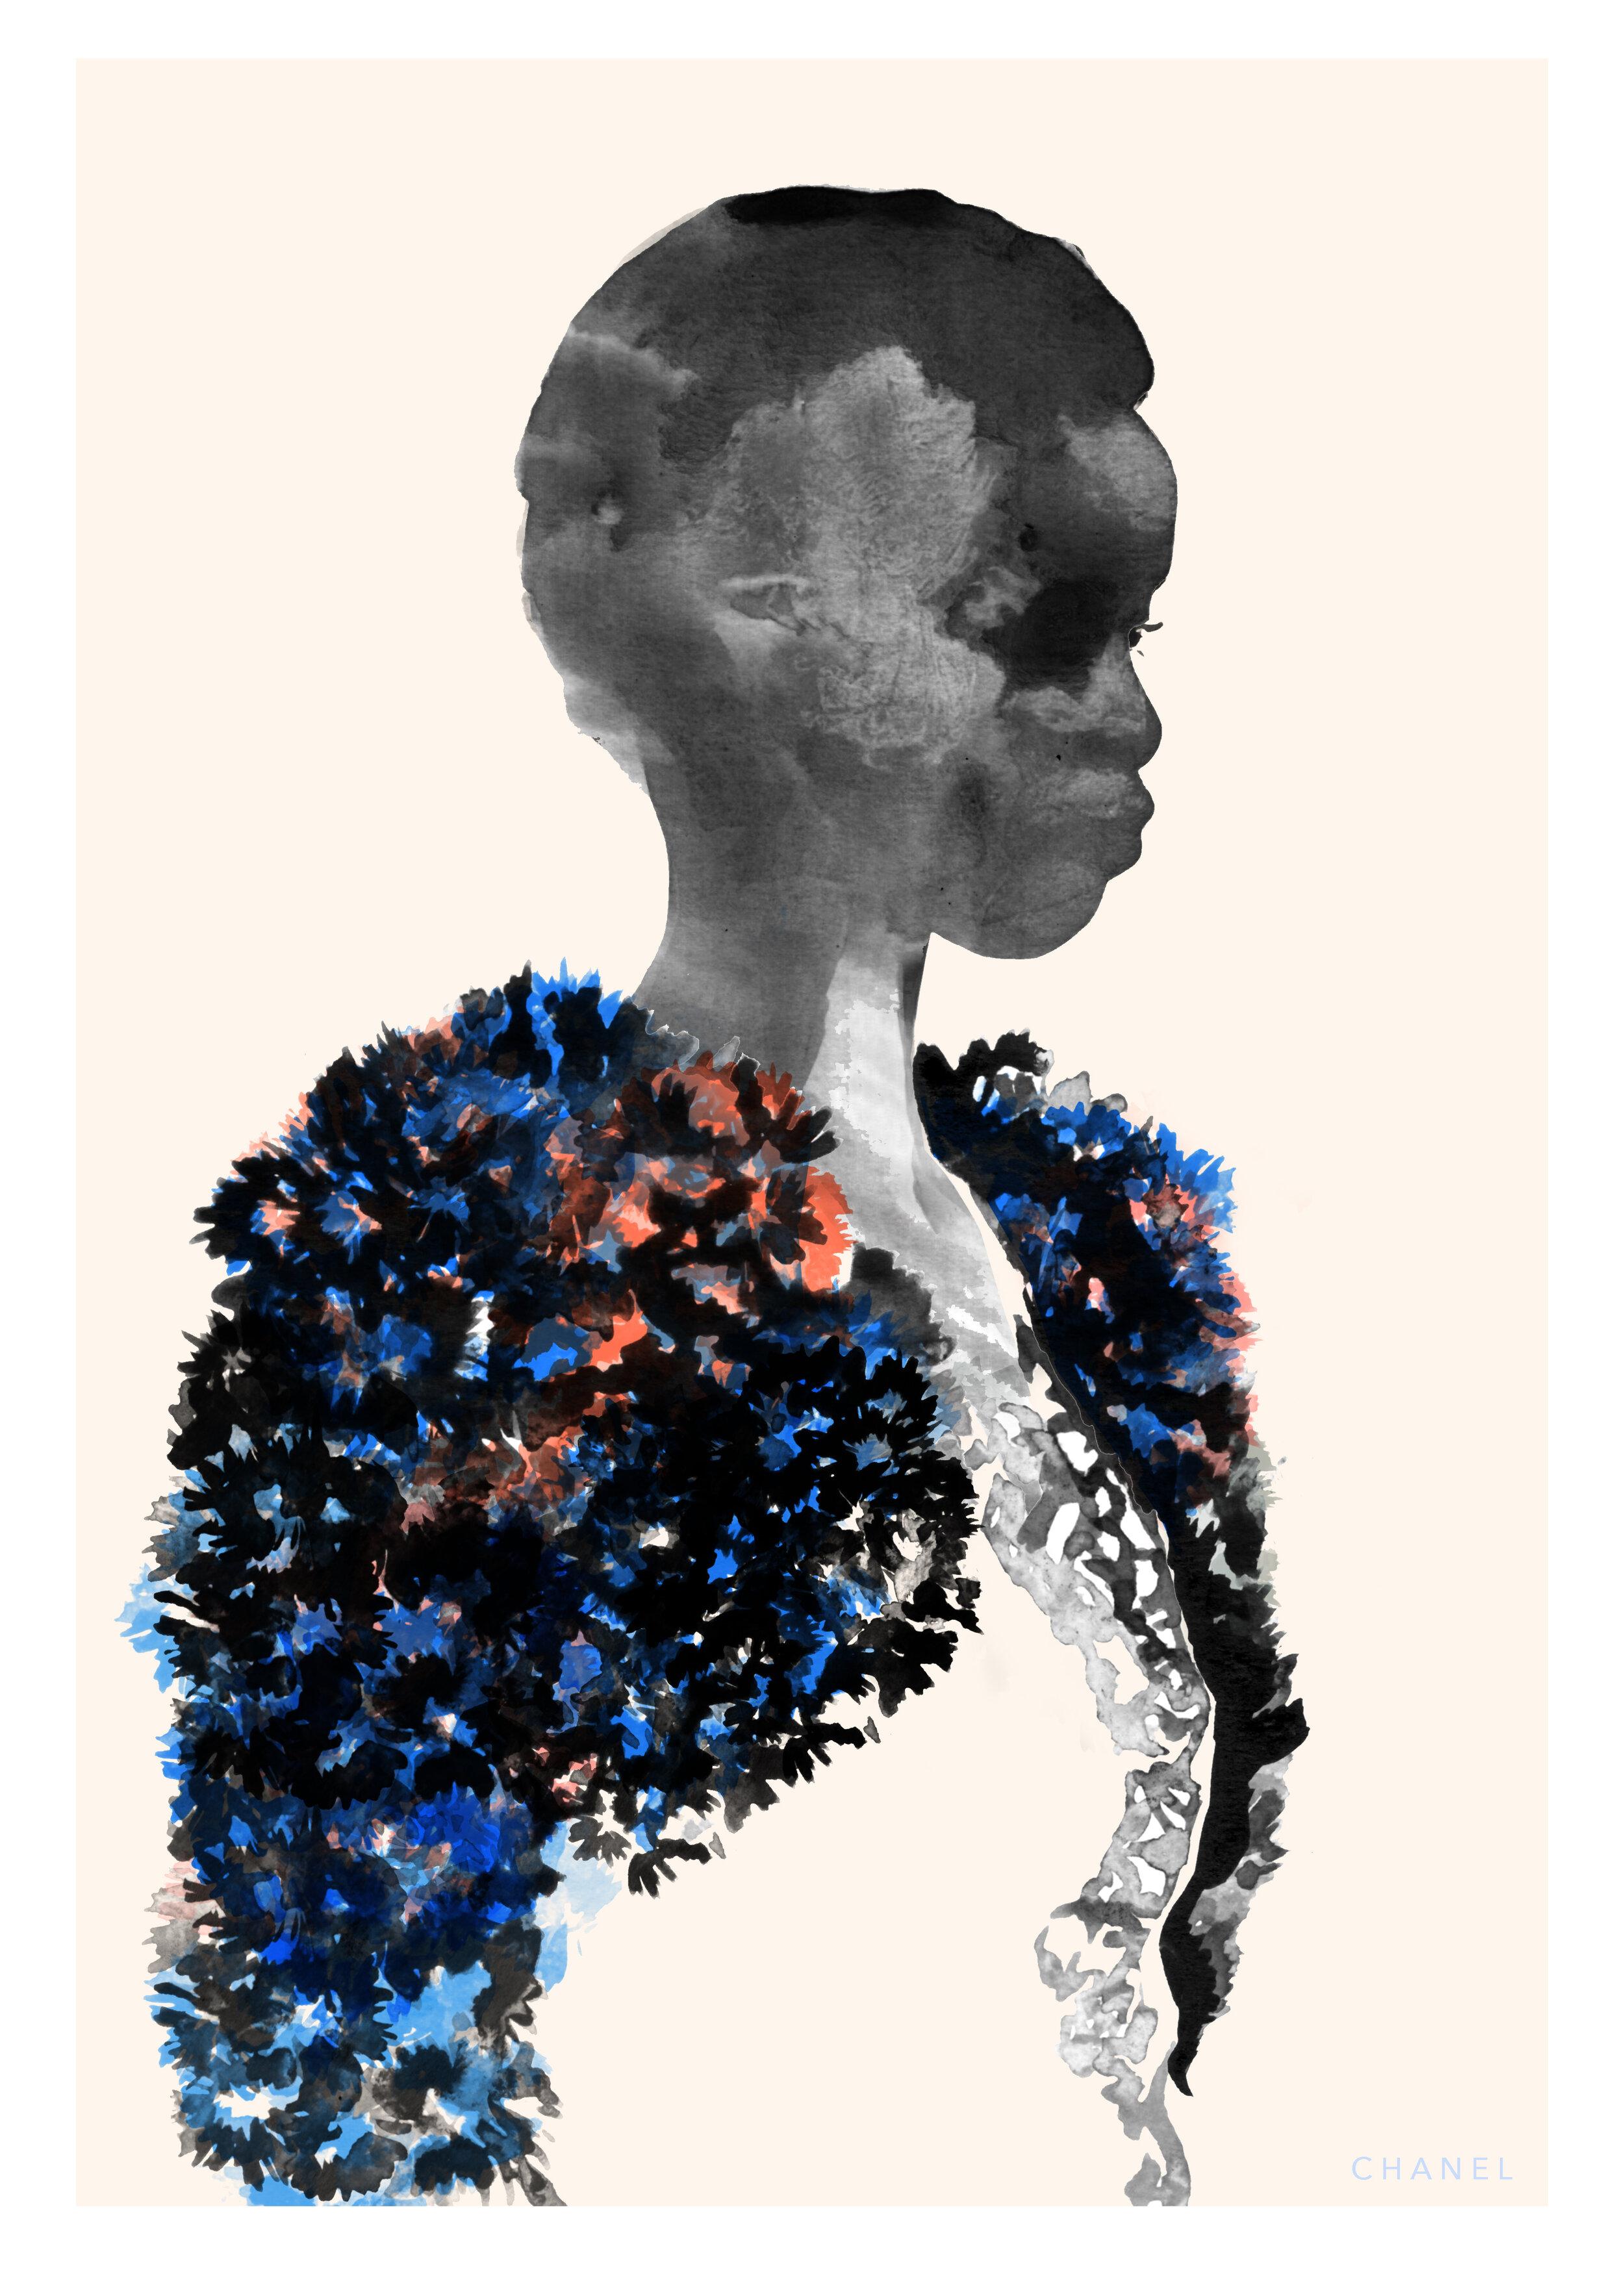 joannalyla_chanel_couture_fall19_alternative_7.jpg